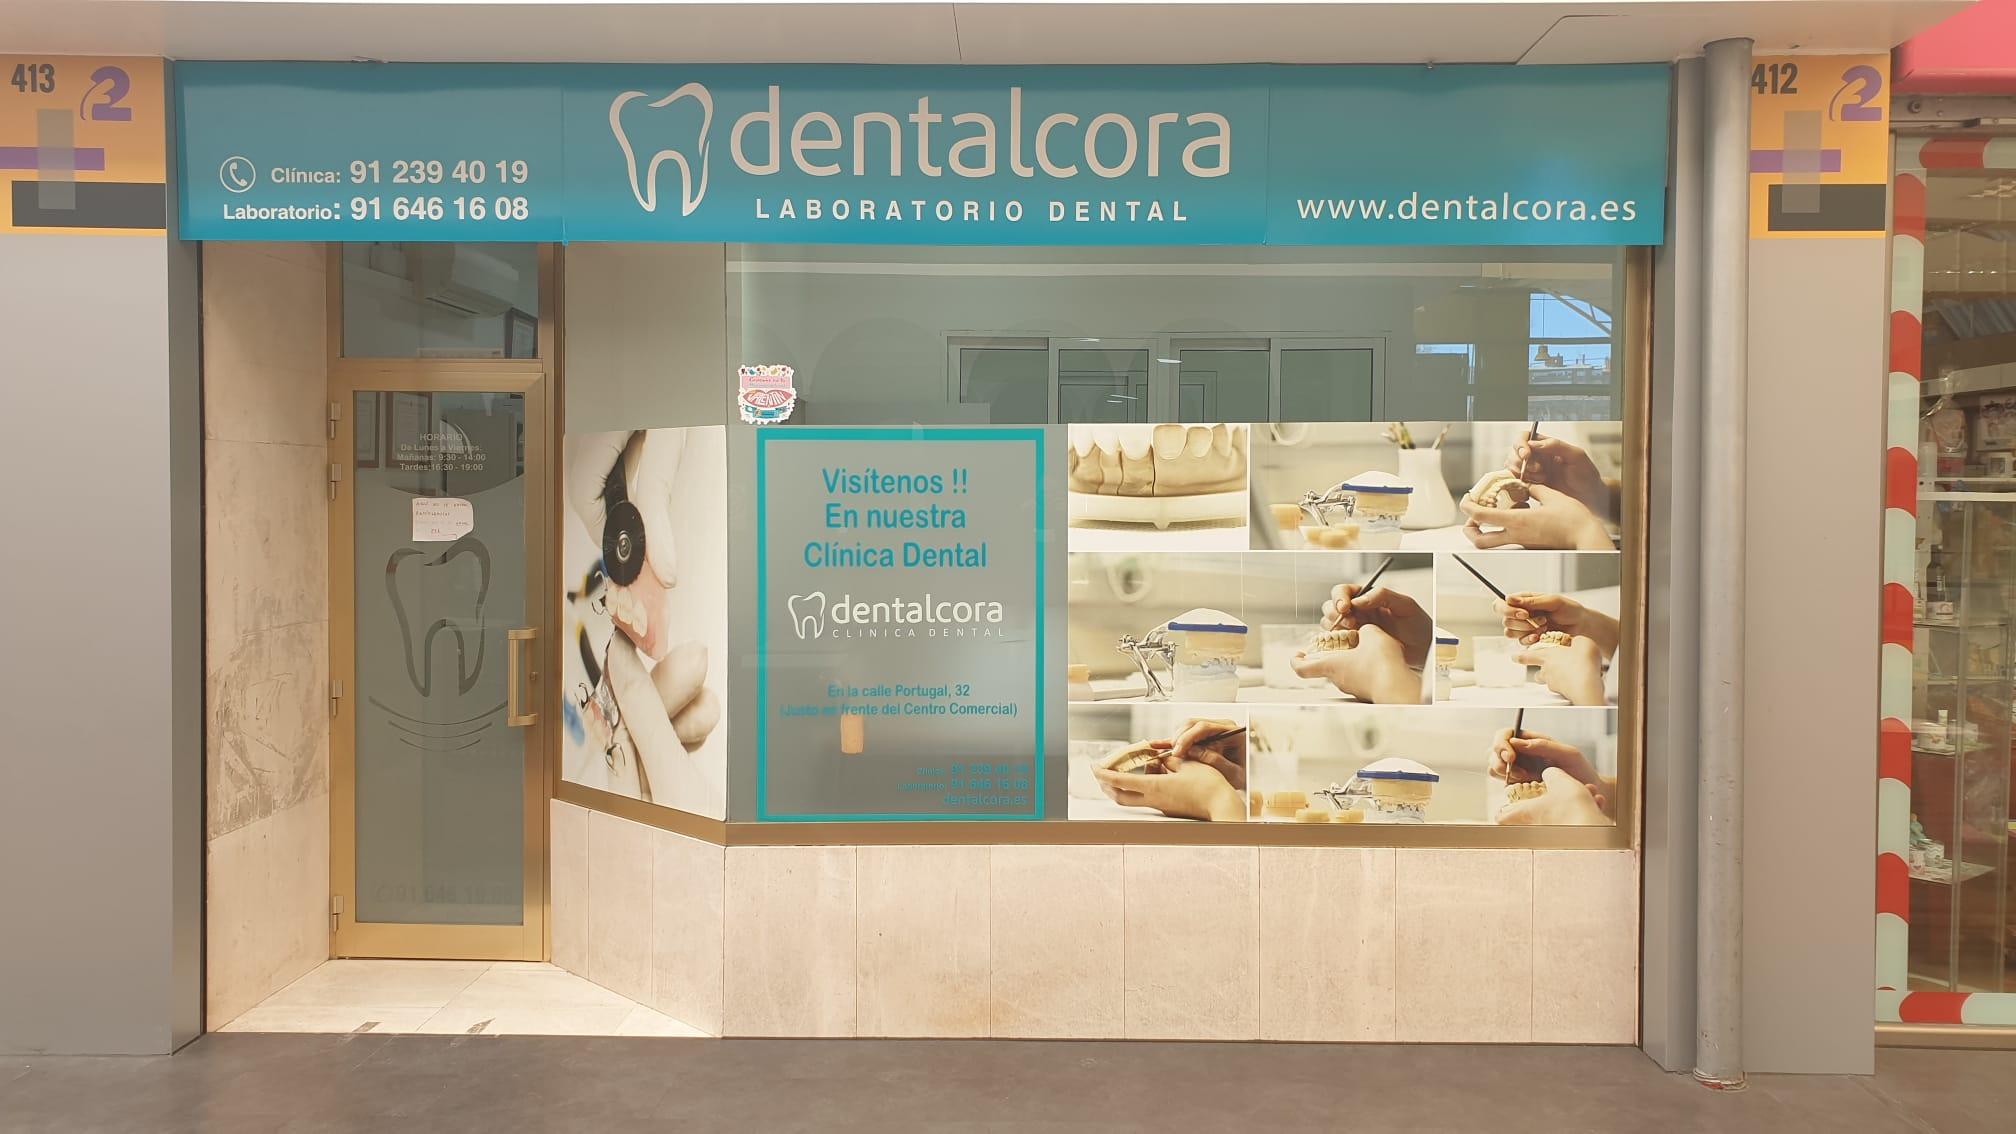 Dentalcora